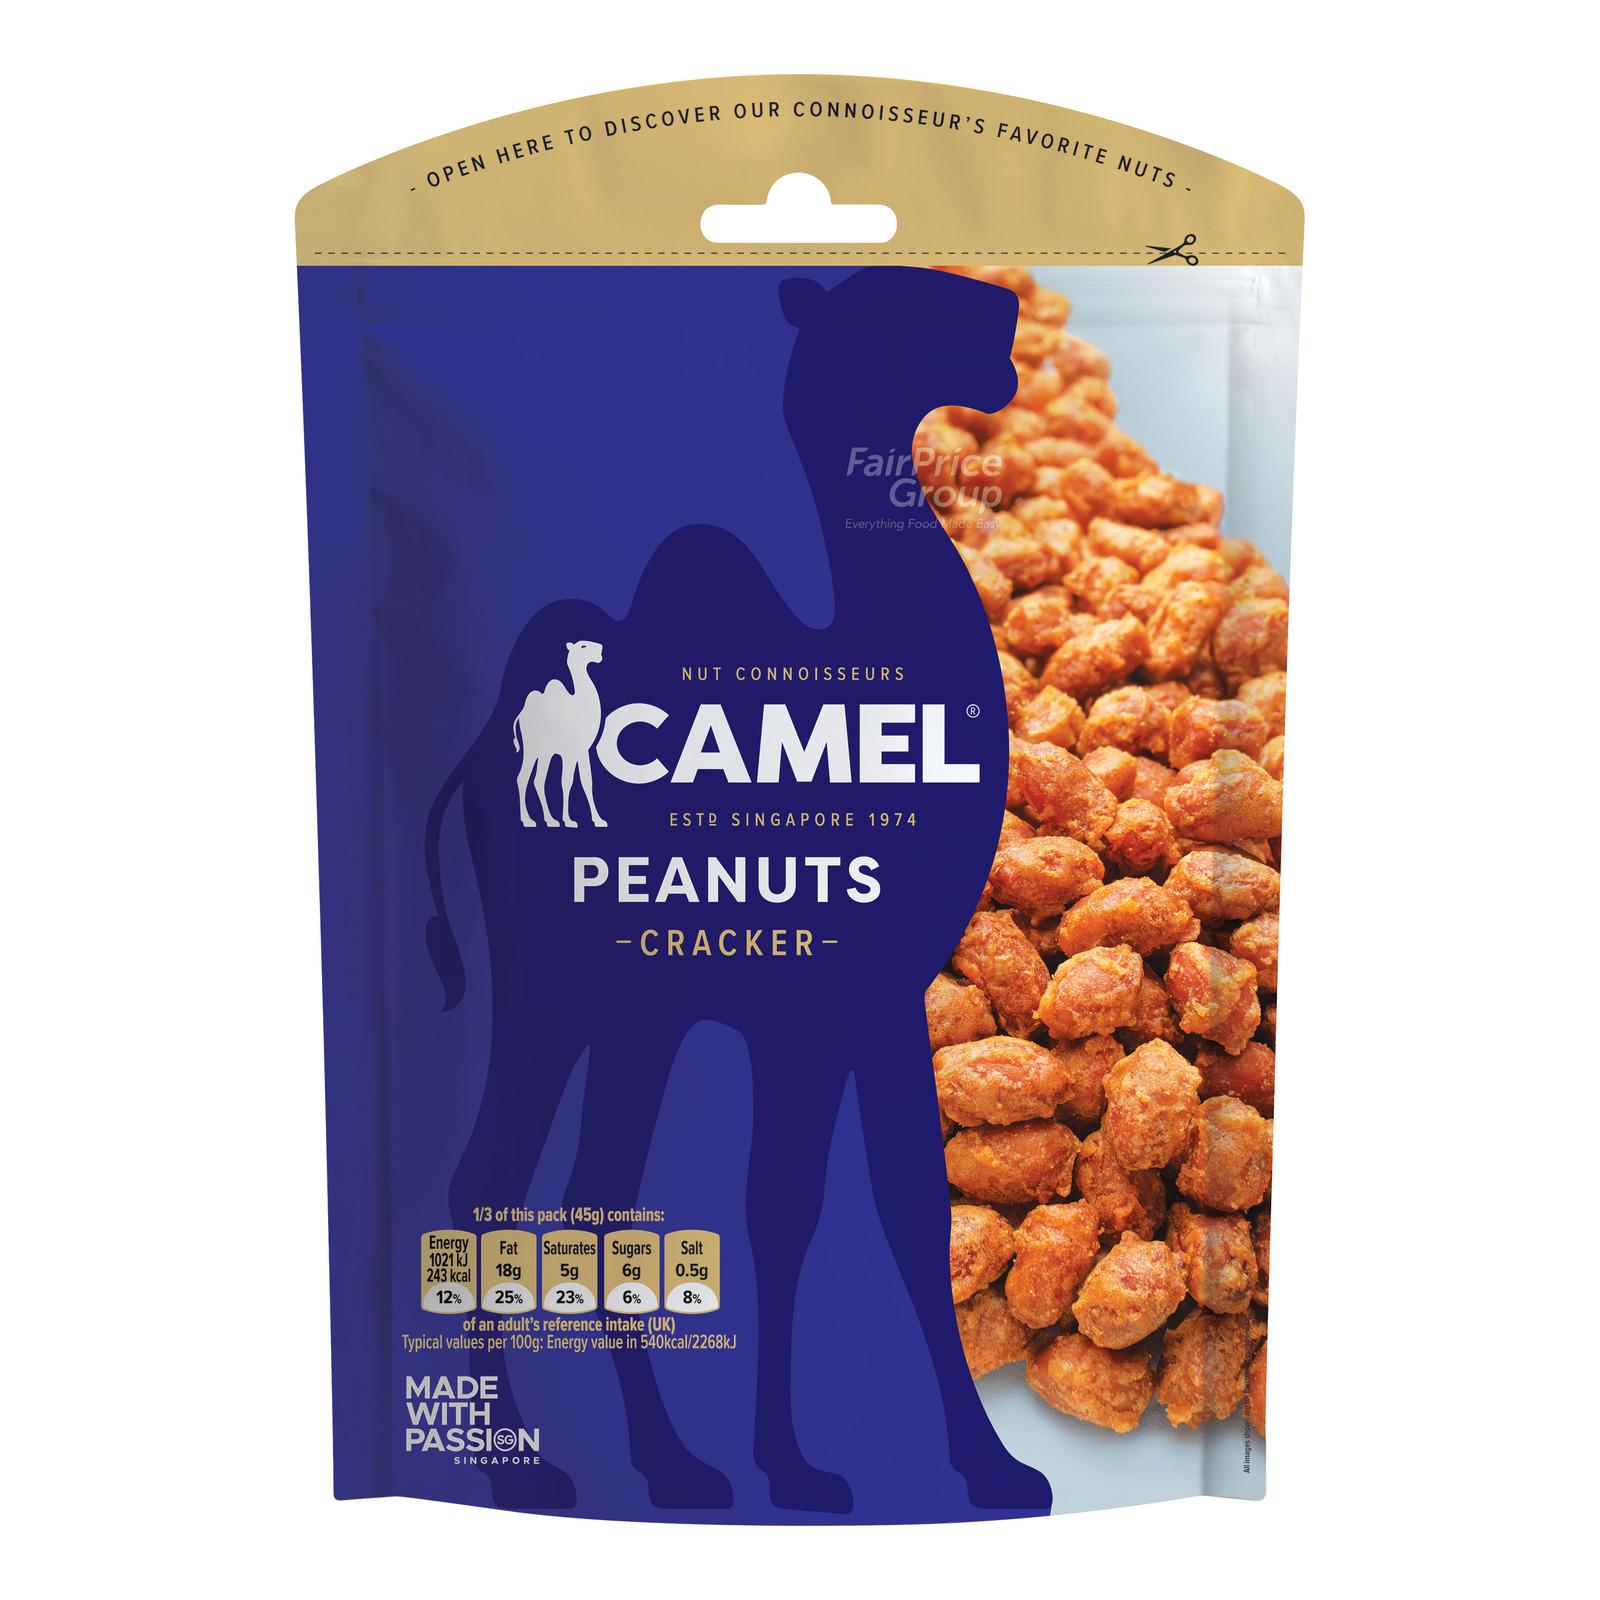 Camel Coated Peanuts - Cracker